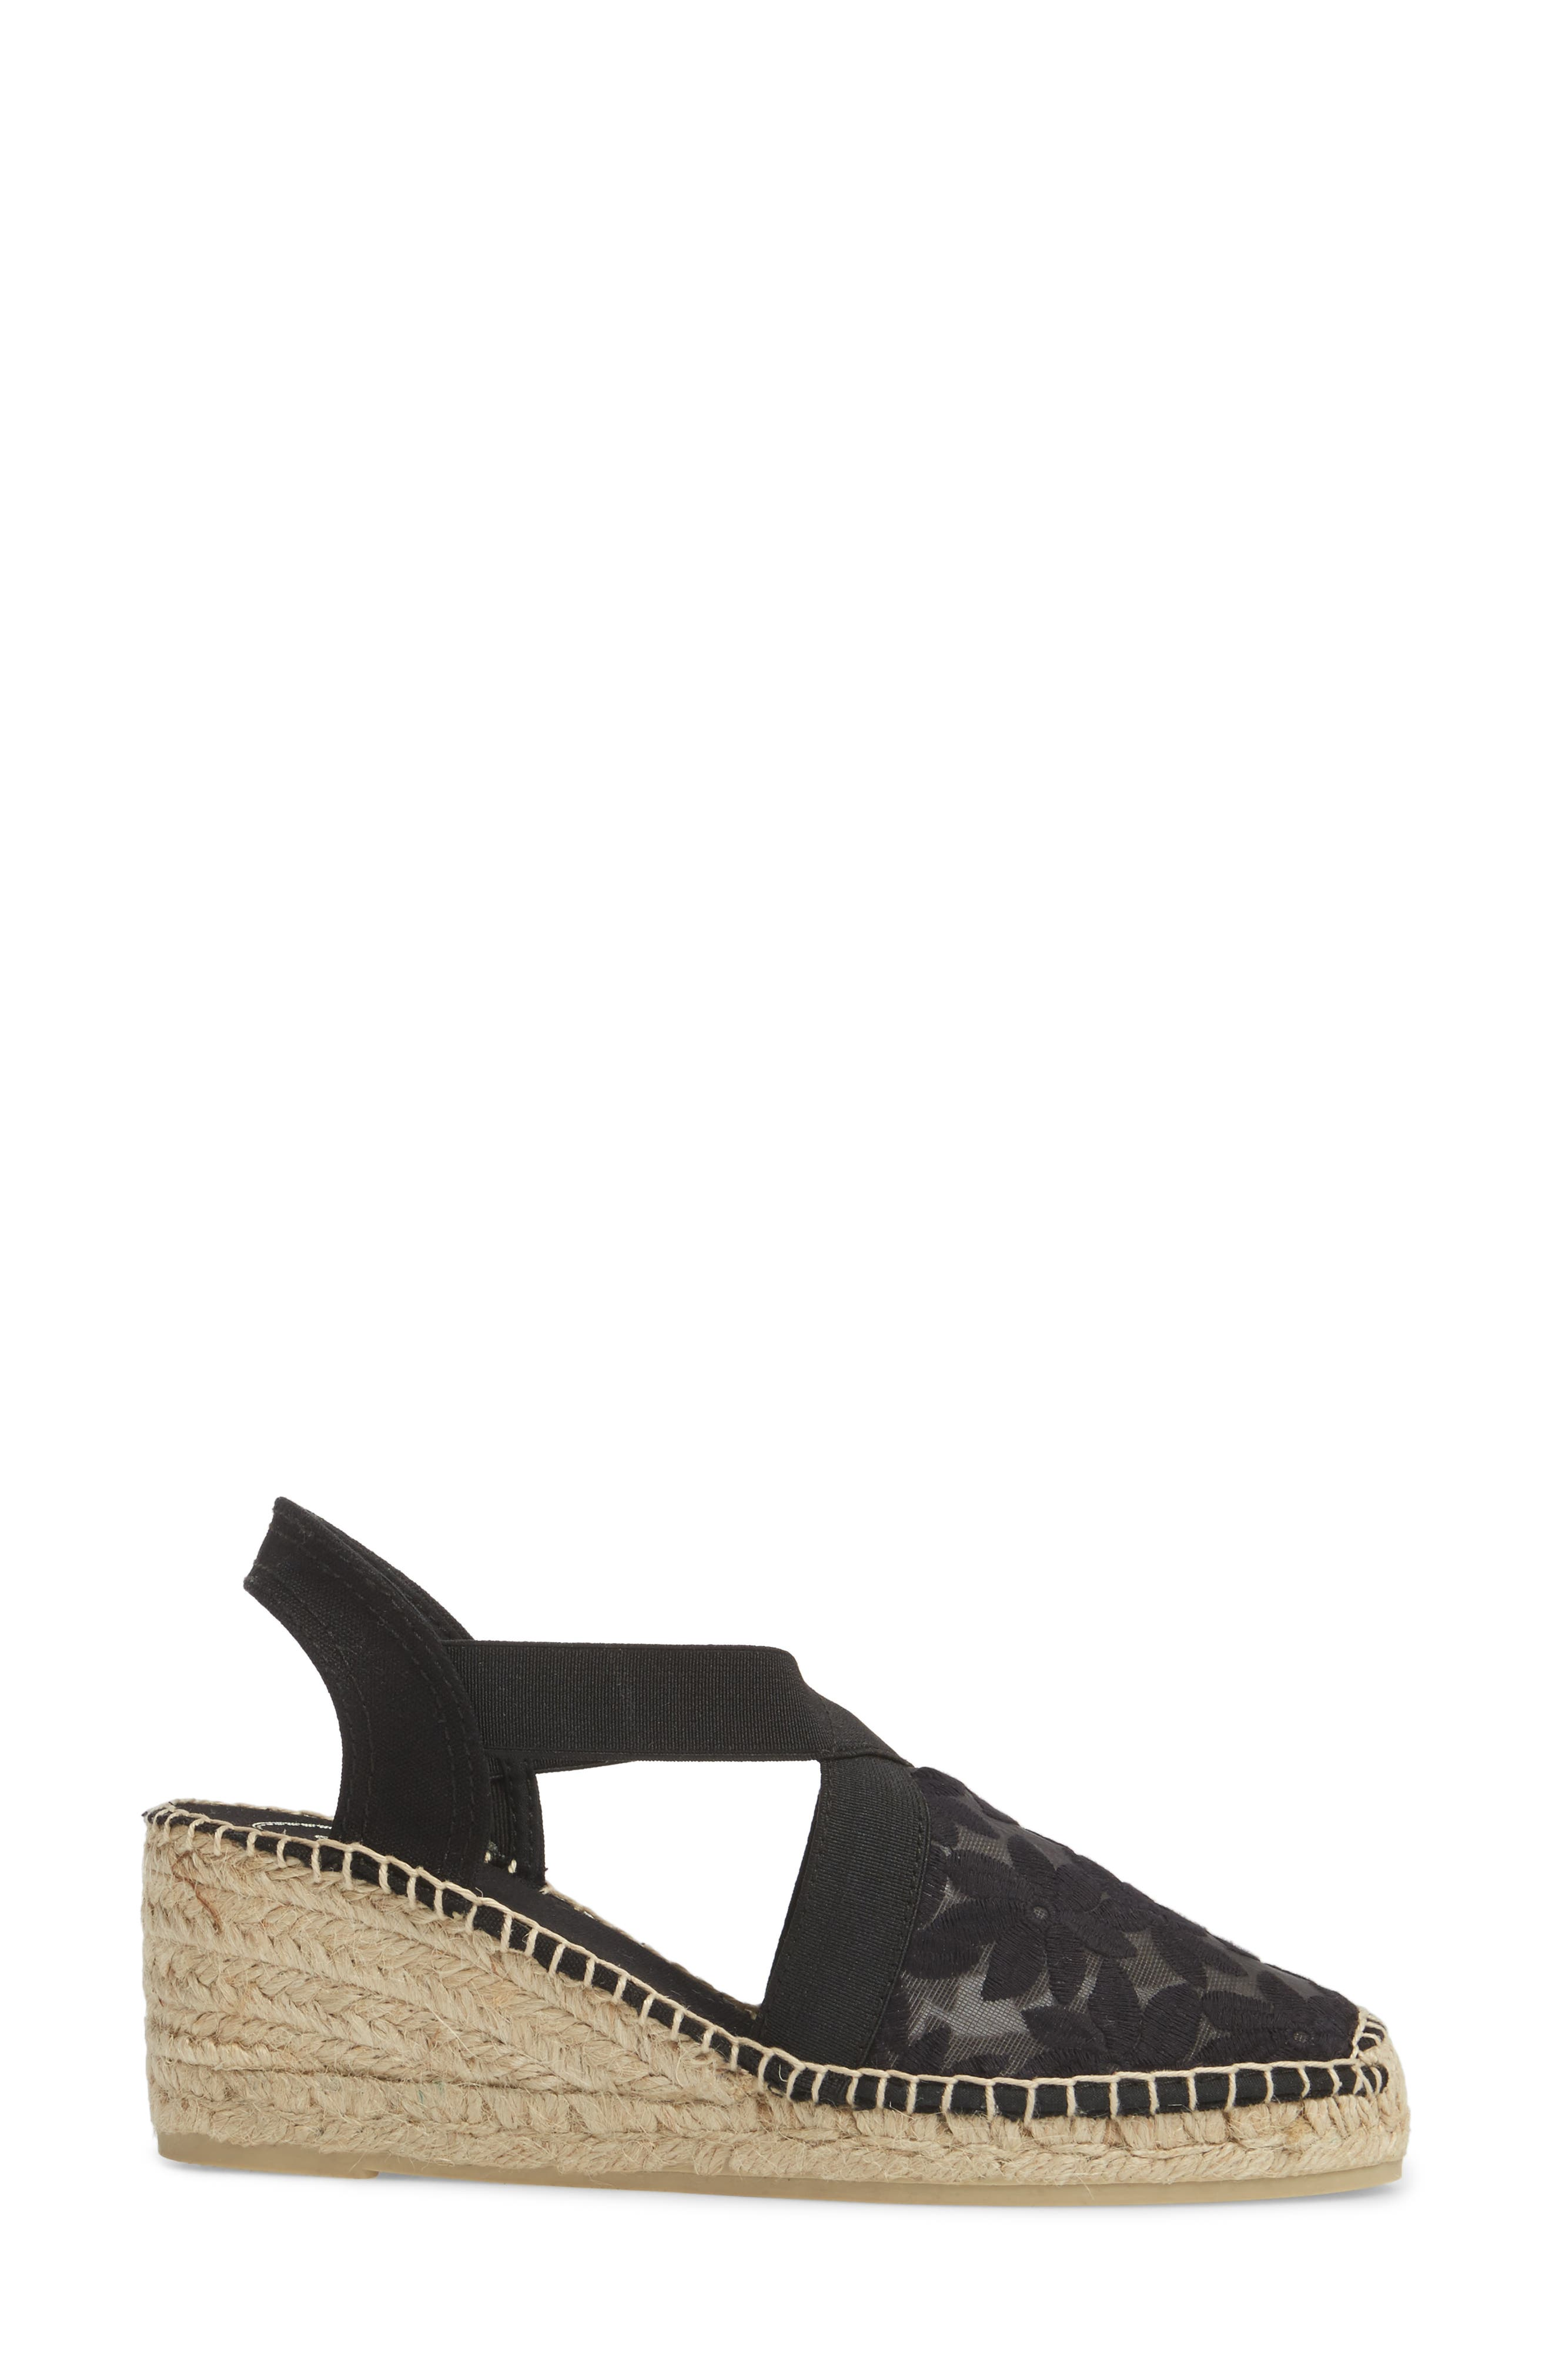 Terra Espadrille Wedge Sandal,                             Alternate thumbnail 3, color,                             Black Fabric